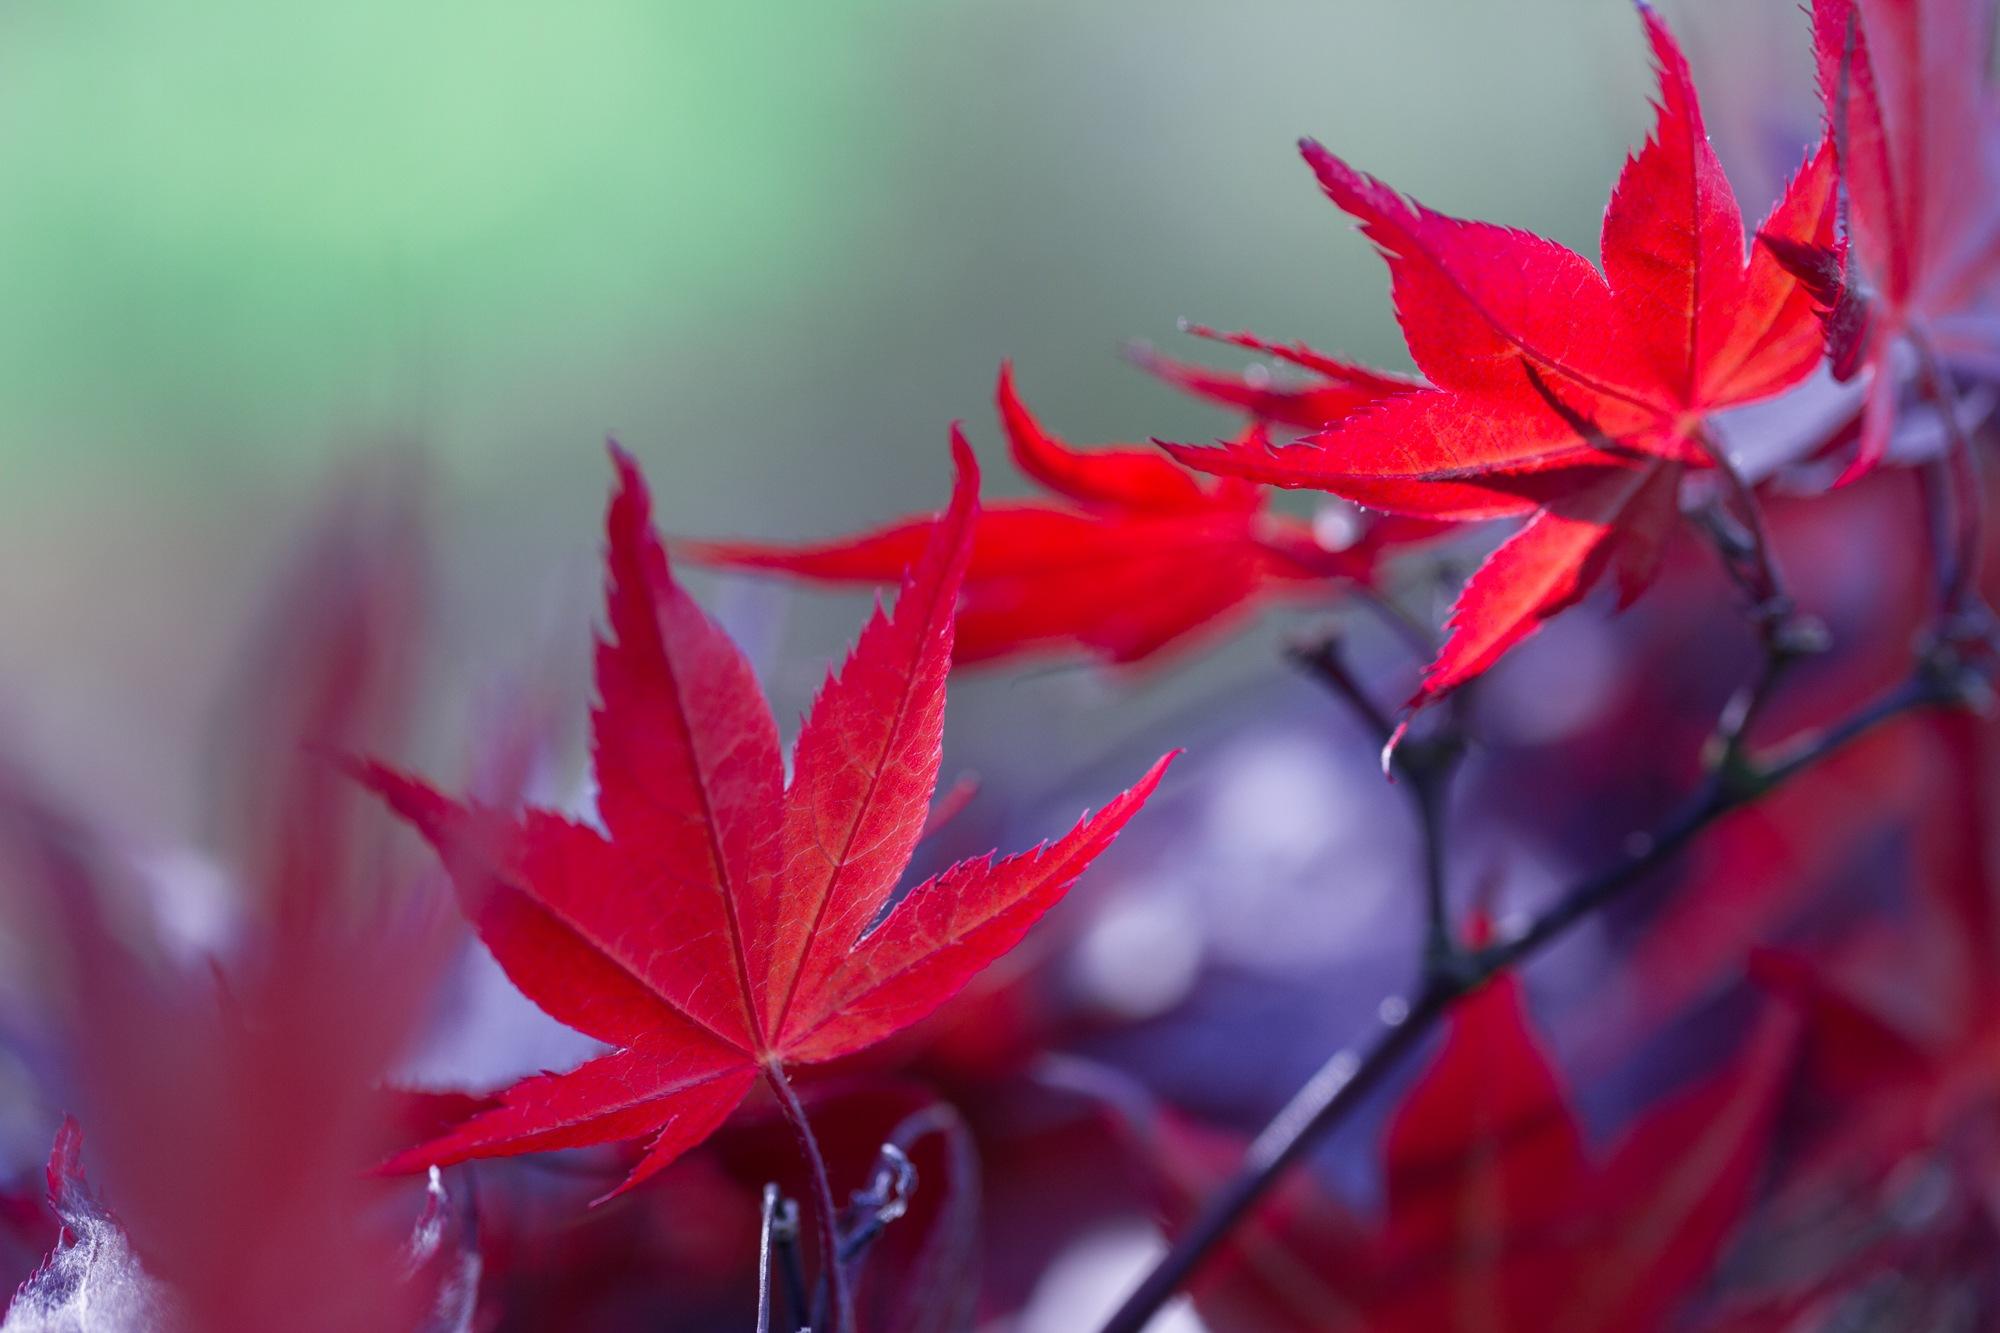 Japanese Maple by Wanja Wiese